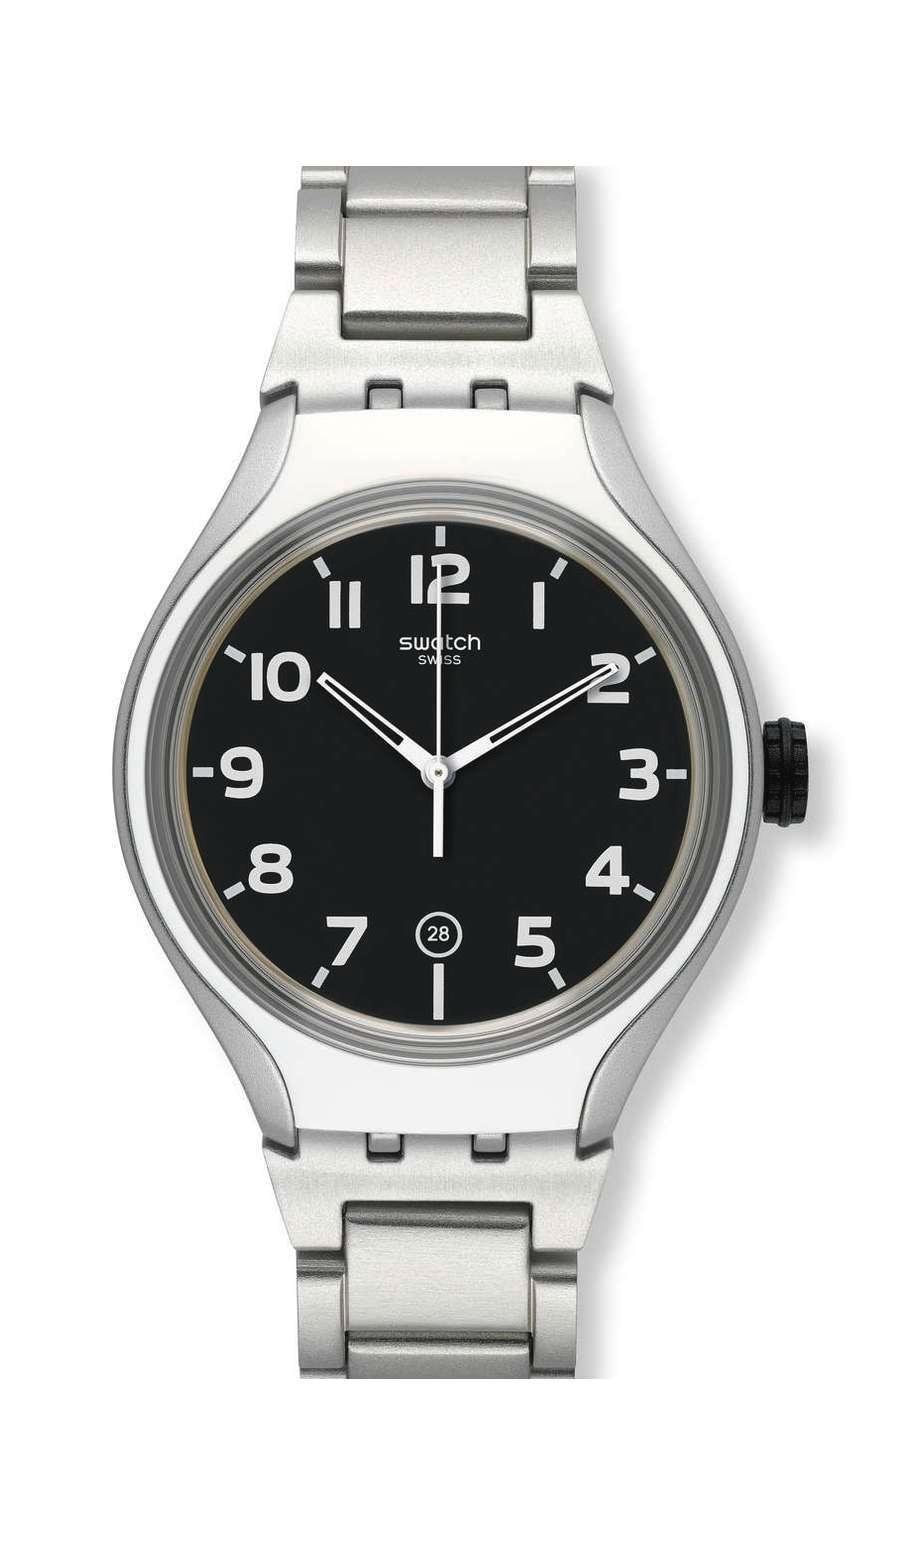 Swatch - STRIPE BACK - 1